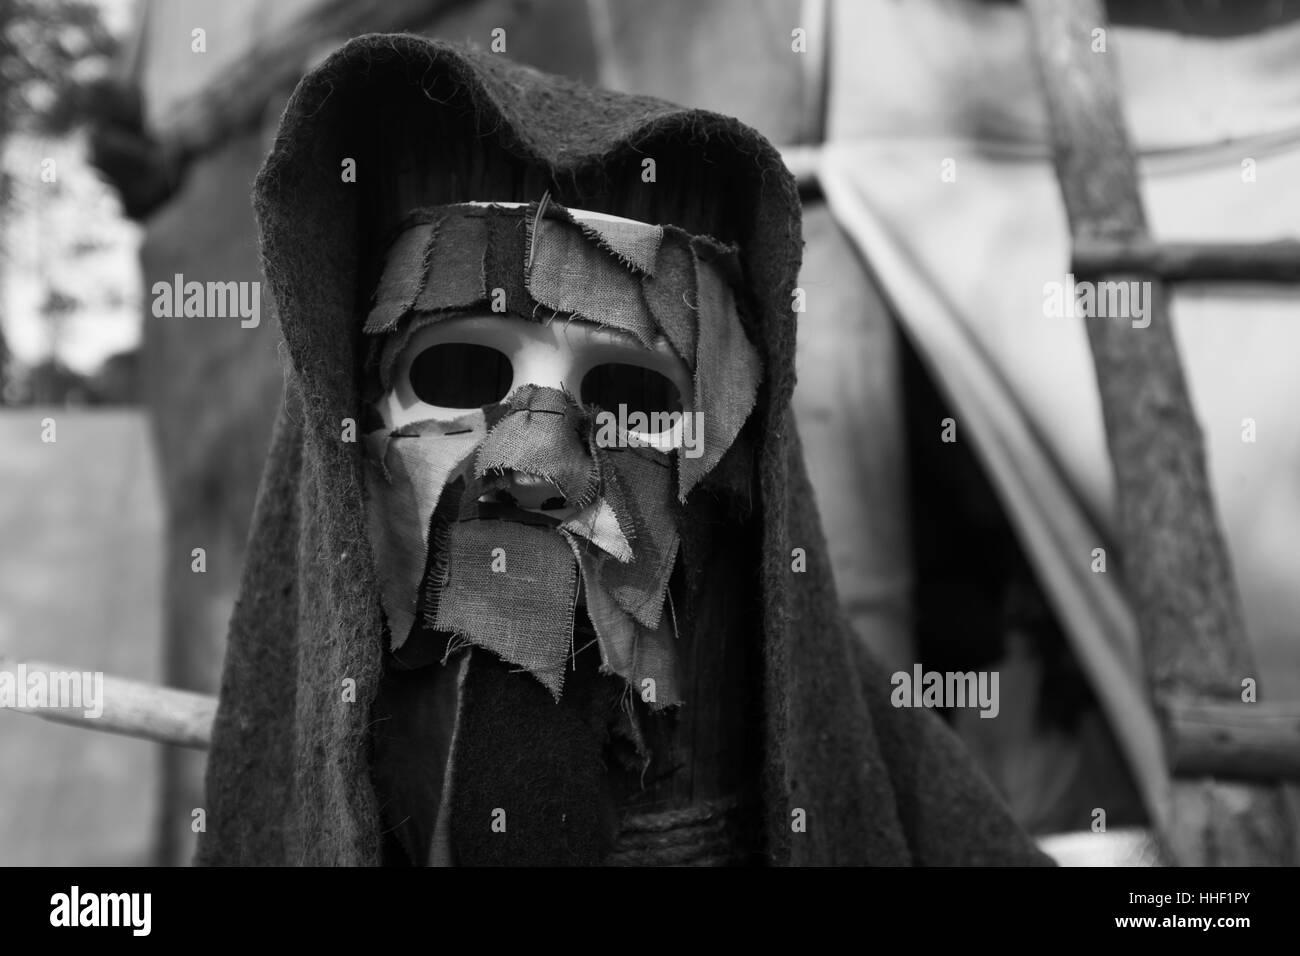 Creepy halloween mask.Horror mask. Halloween costume. - Stock Image